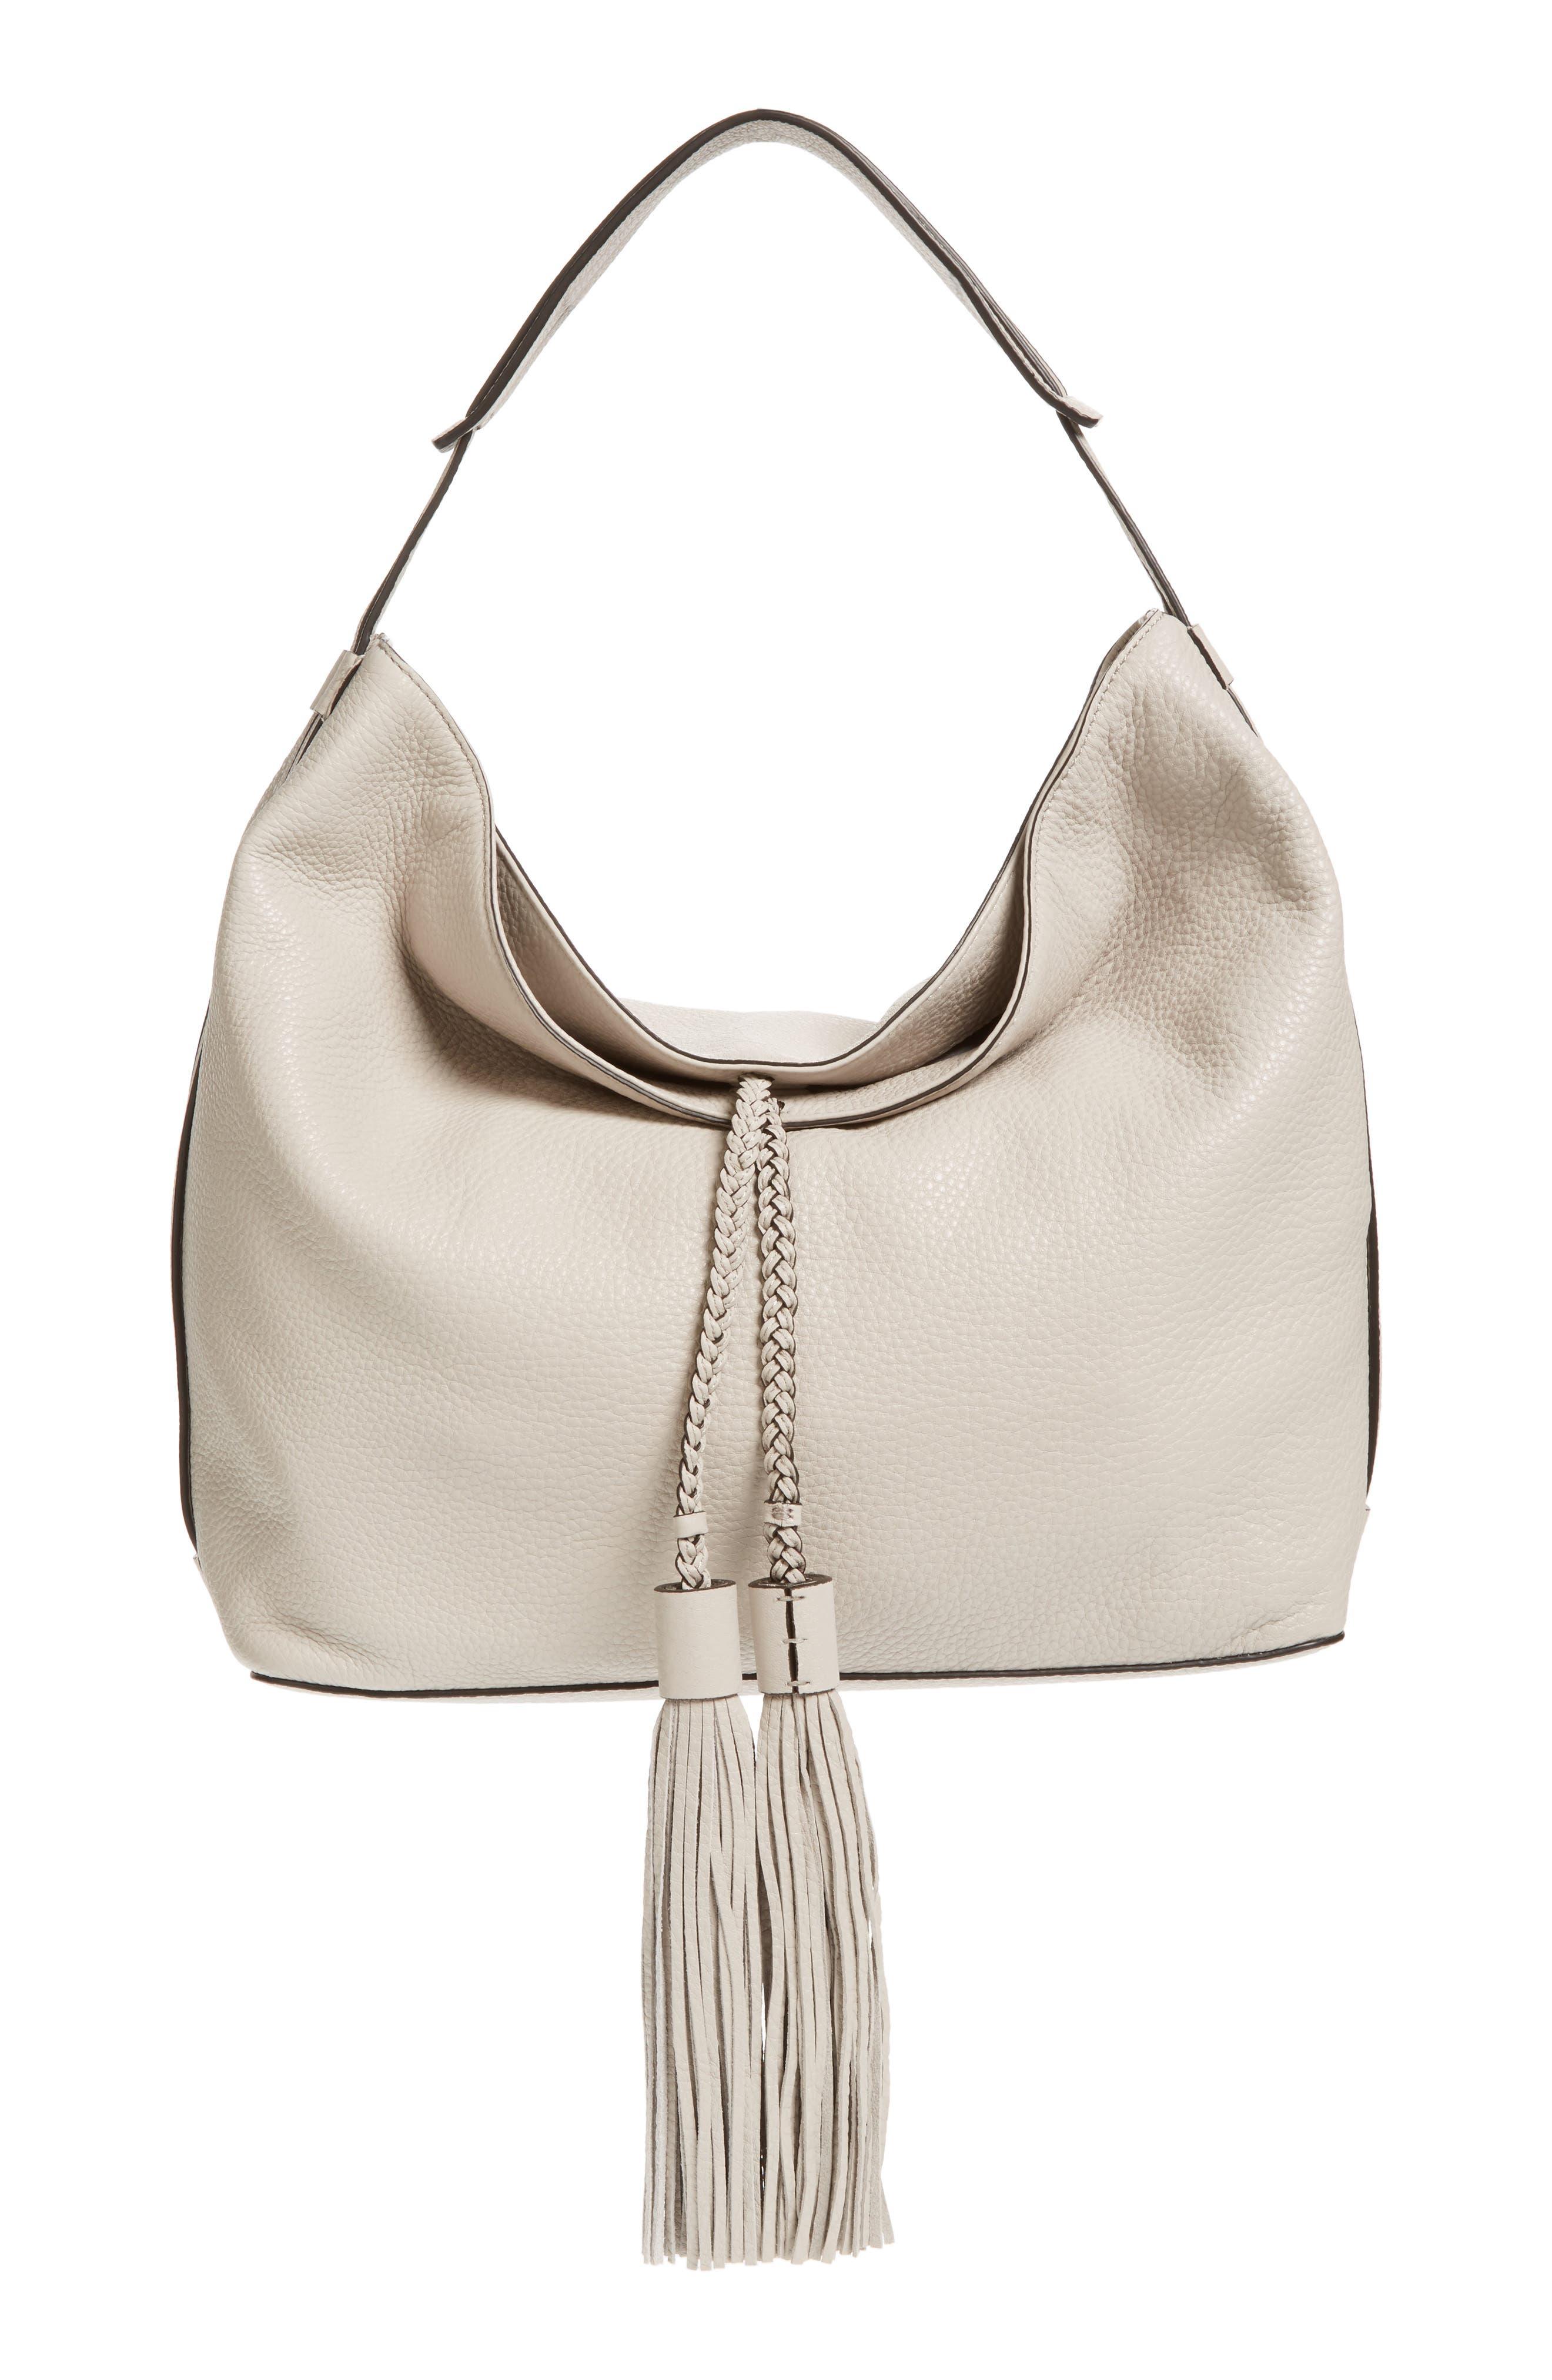 REBECCA MINKOFF 'Isobel' Tassel Leather Hobo